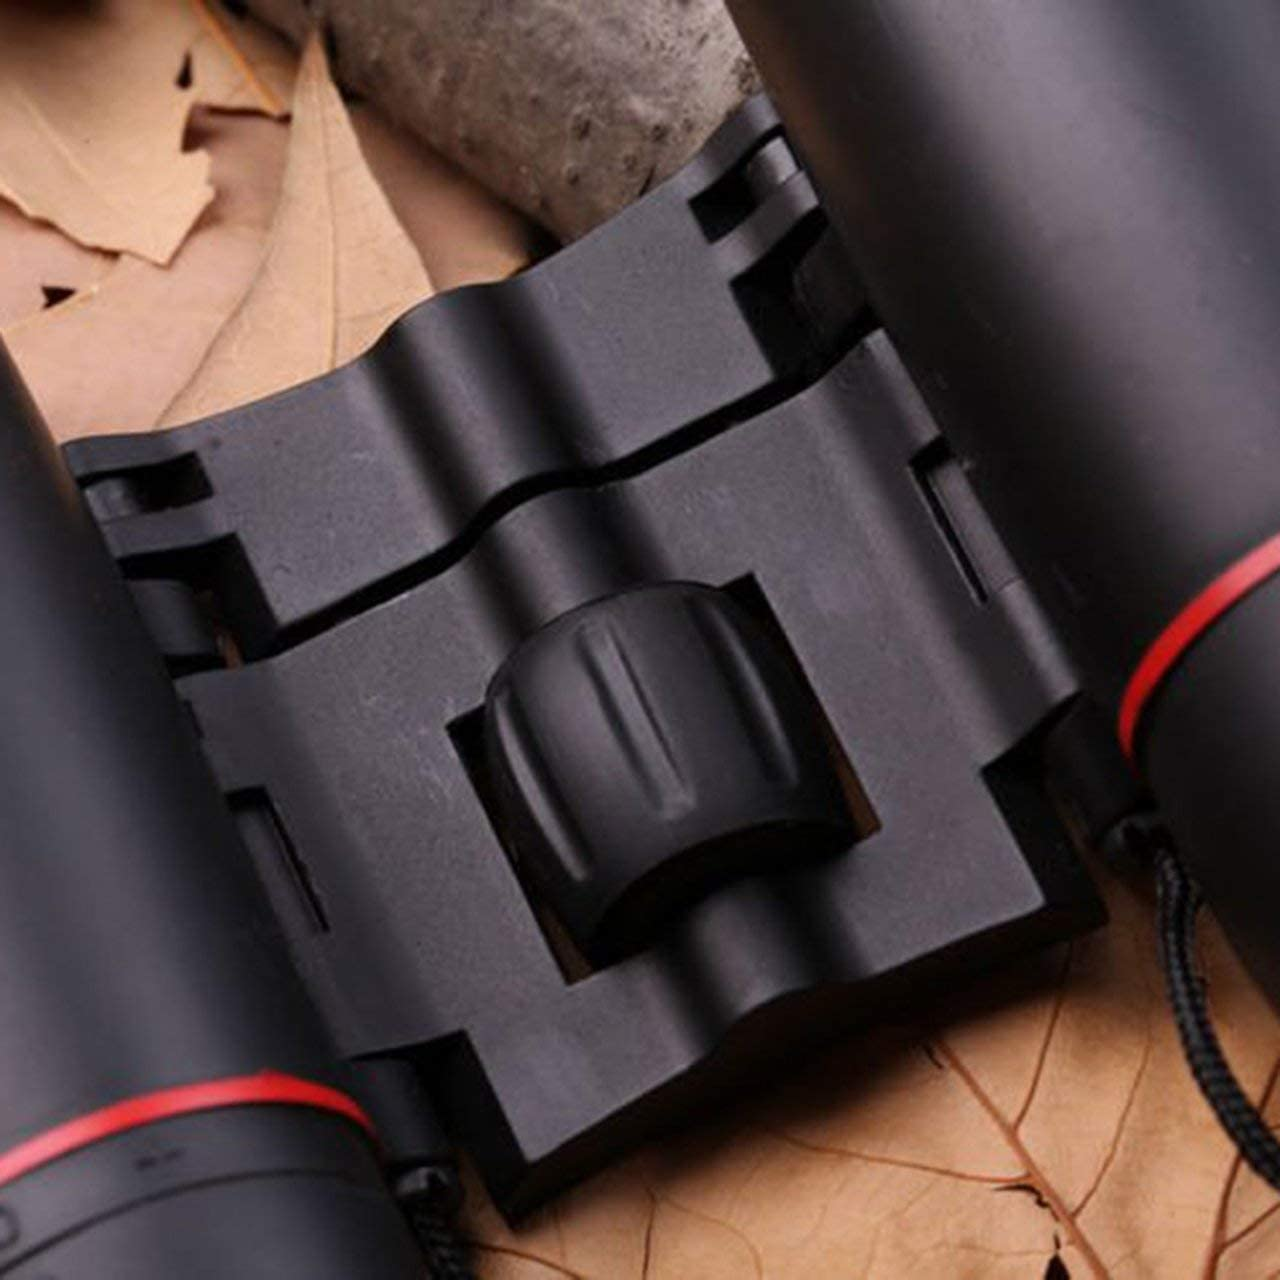 Small Folding Binoculars Mini Binoculars 30X60 HD Wide Angle Portable Low Light Level Night Vision Pocket Binoculars